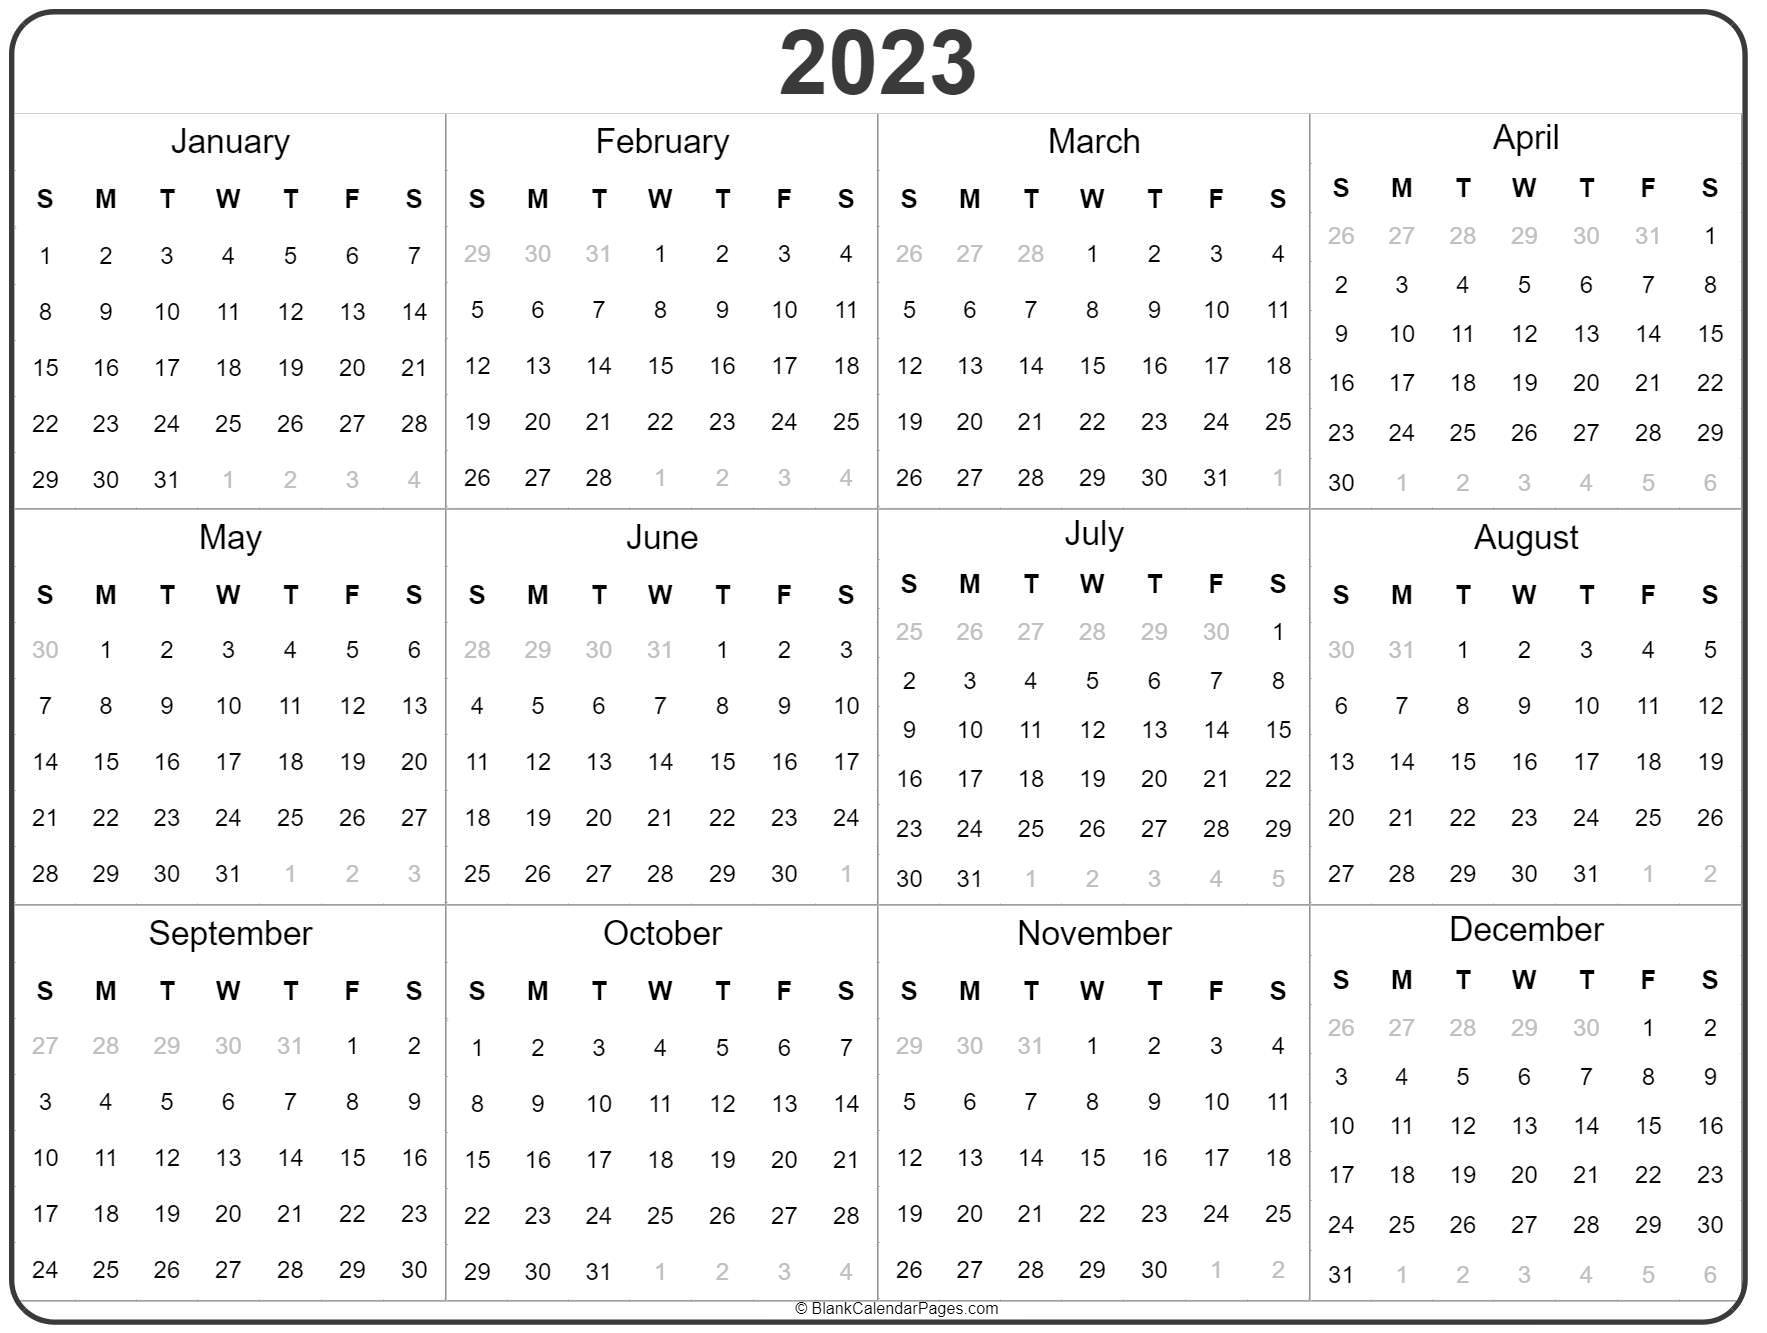 2023 year calendar template